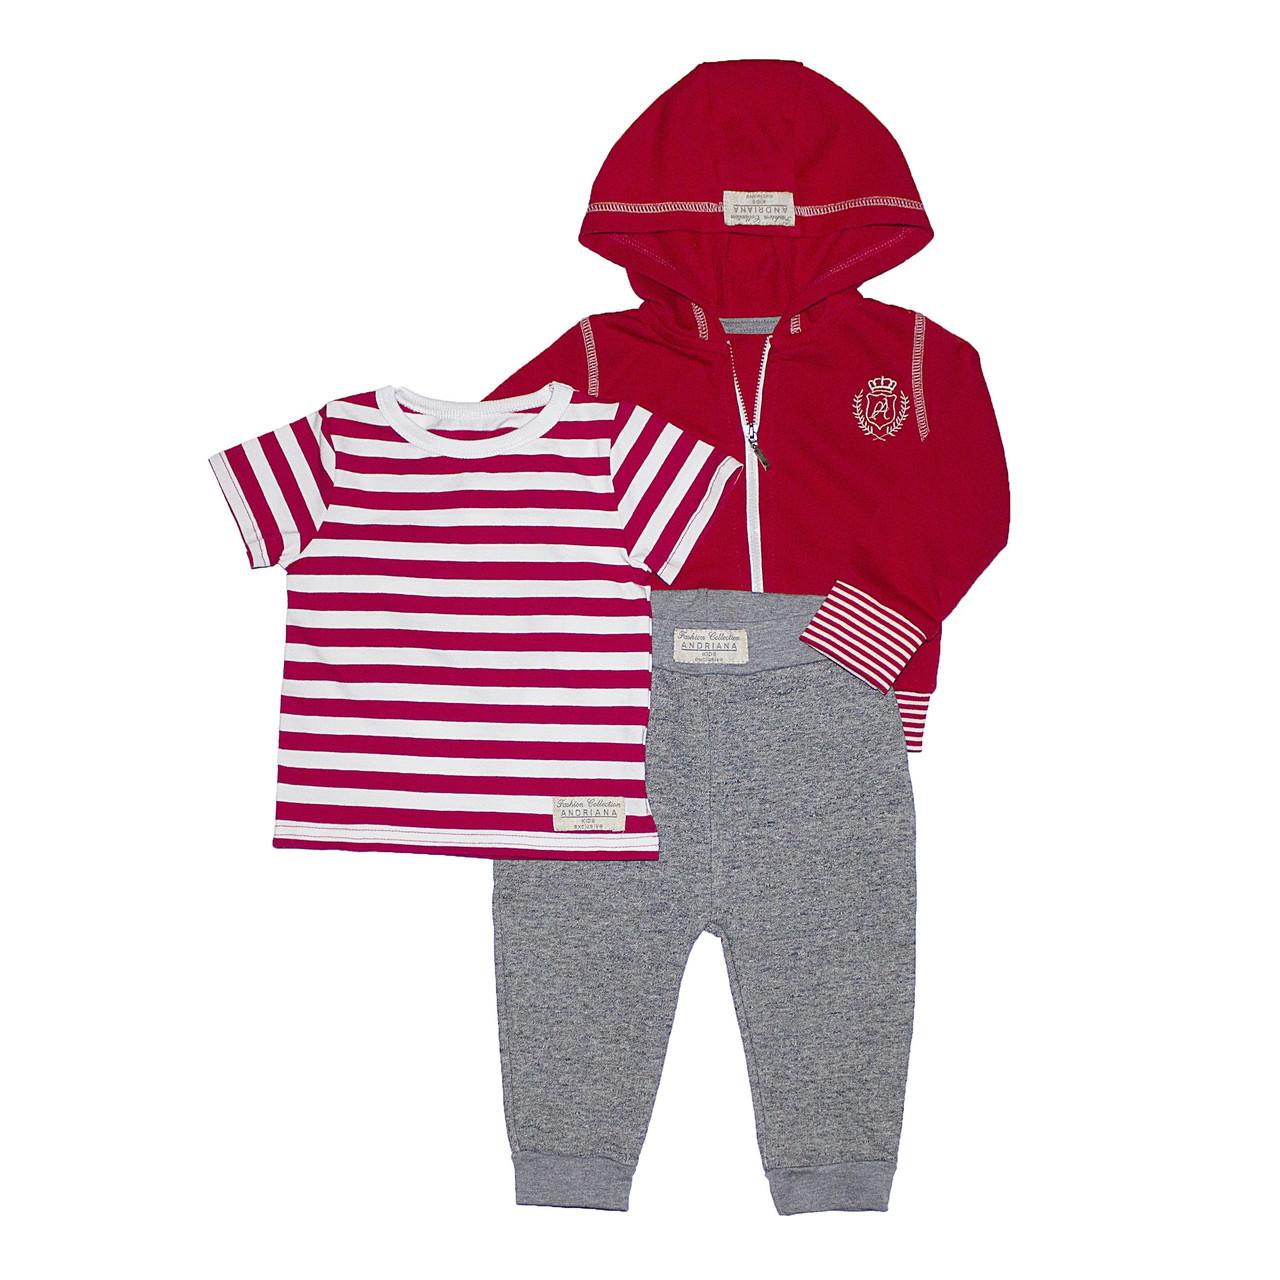 Теплый костюм тройка 1-4 года Andriana Kids красно-серый